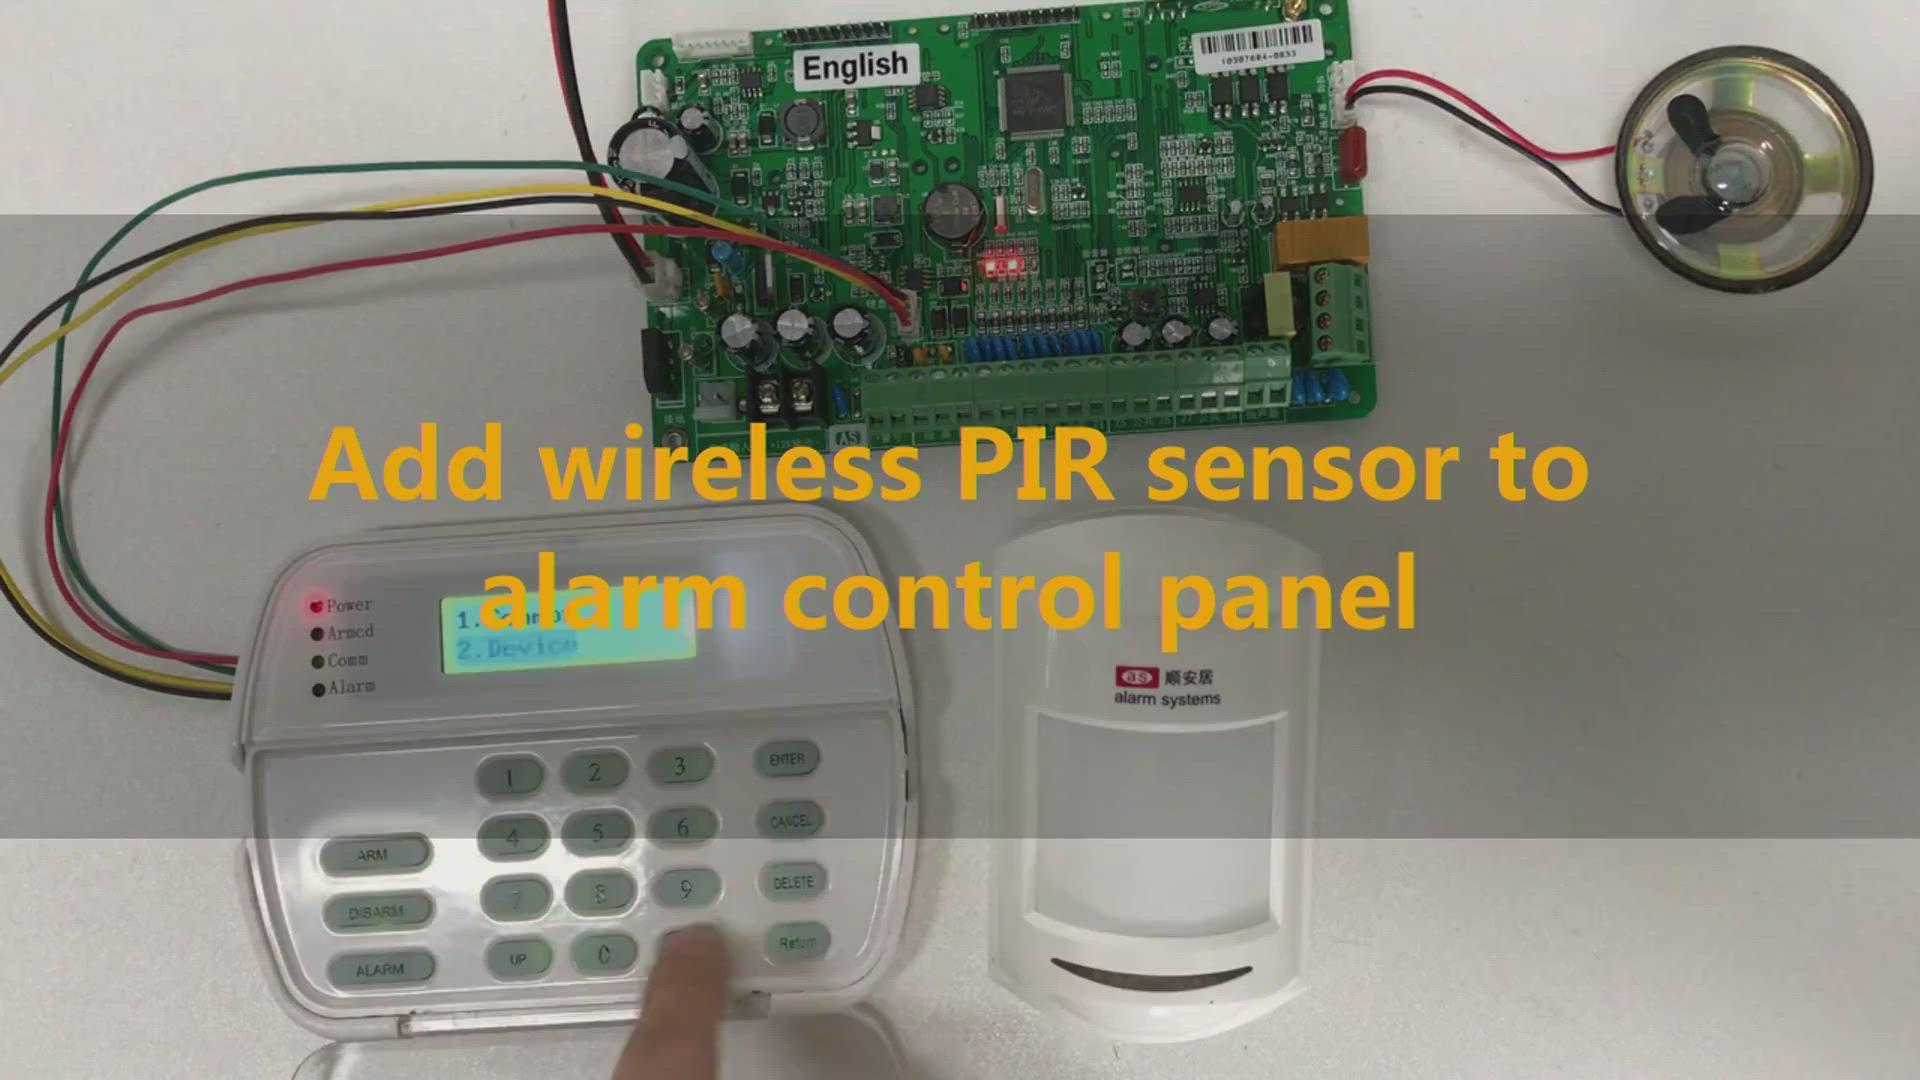 Add wireless PIR sensor to alarm control panel